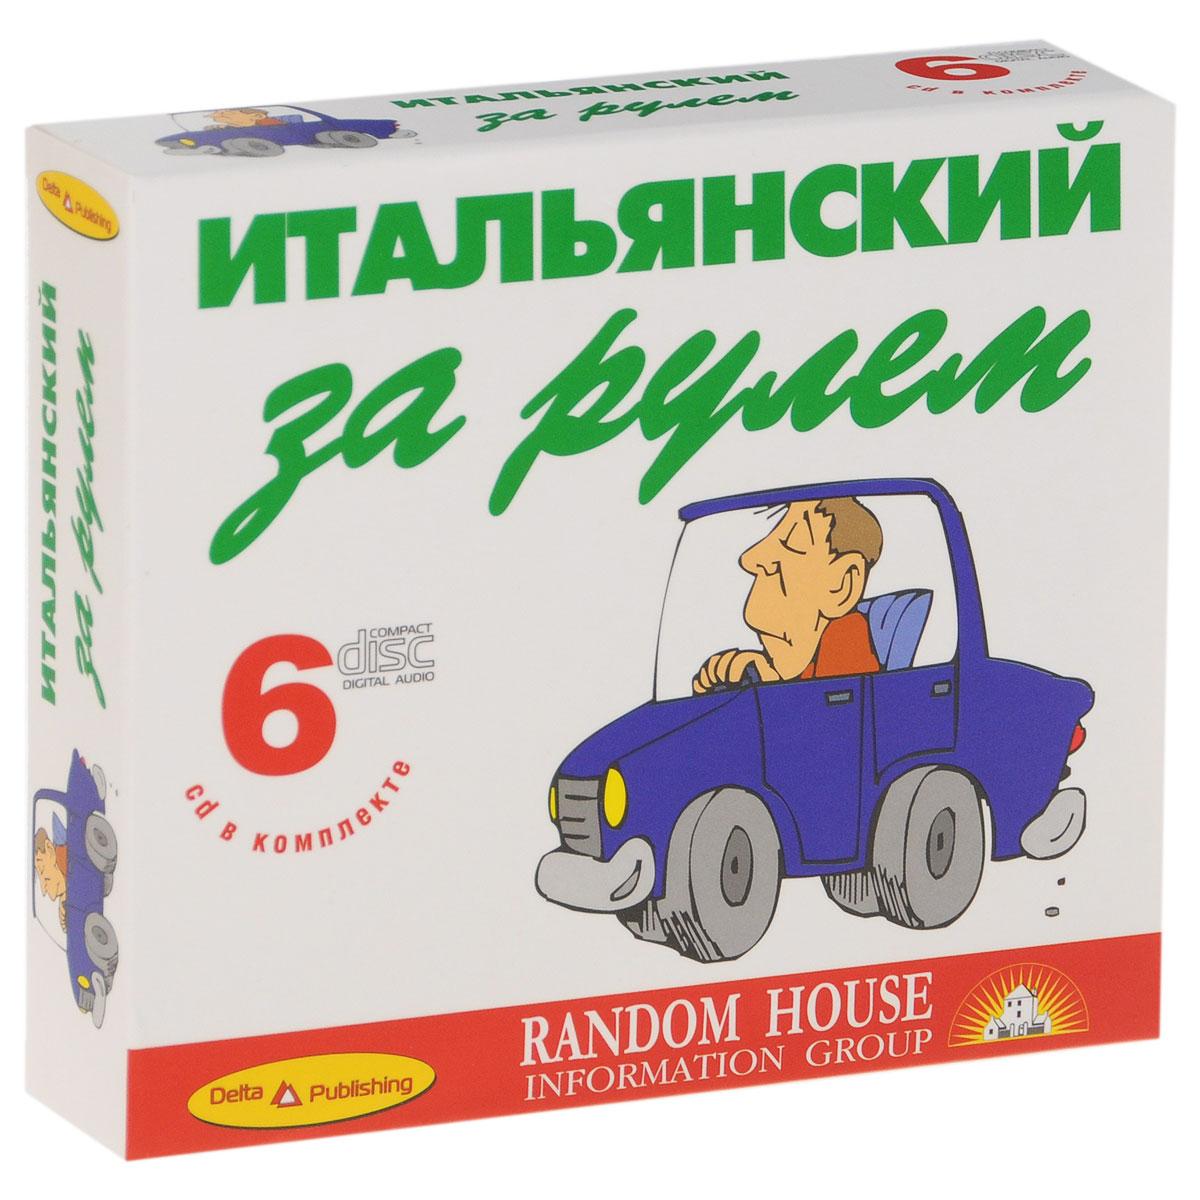 ����������� �� ����� (��������� �� 6 CD)